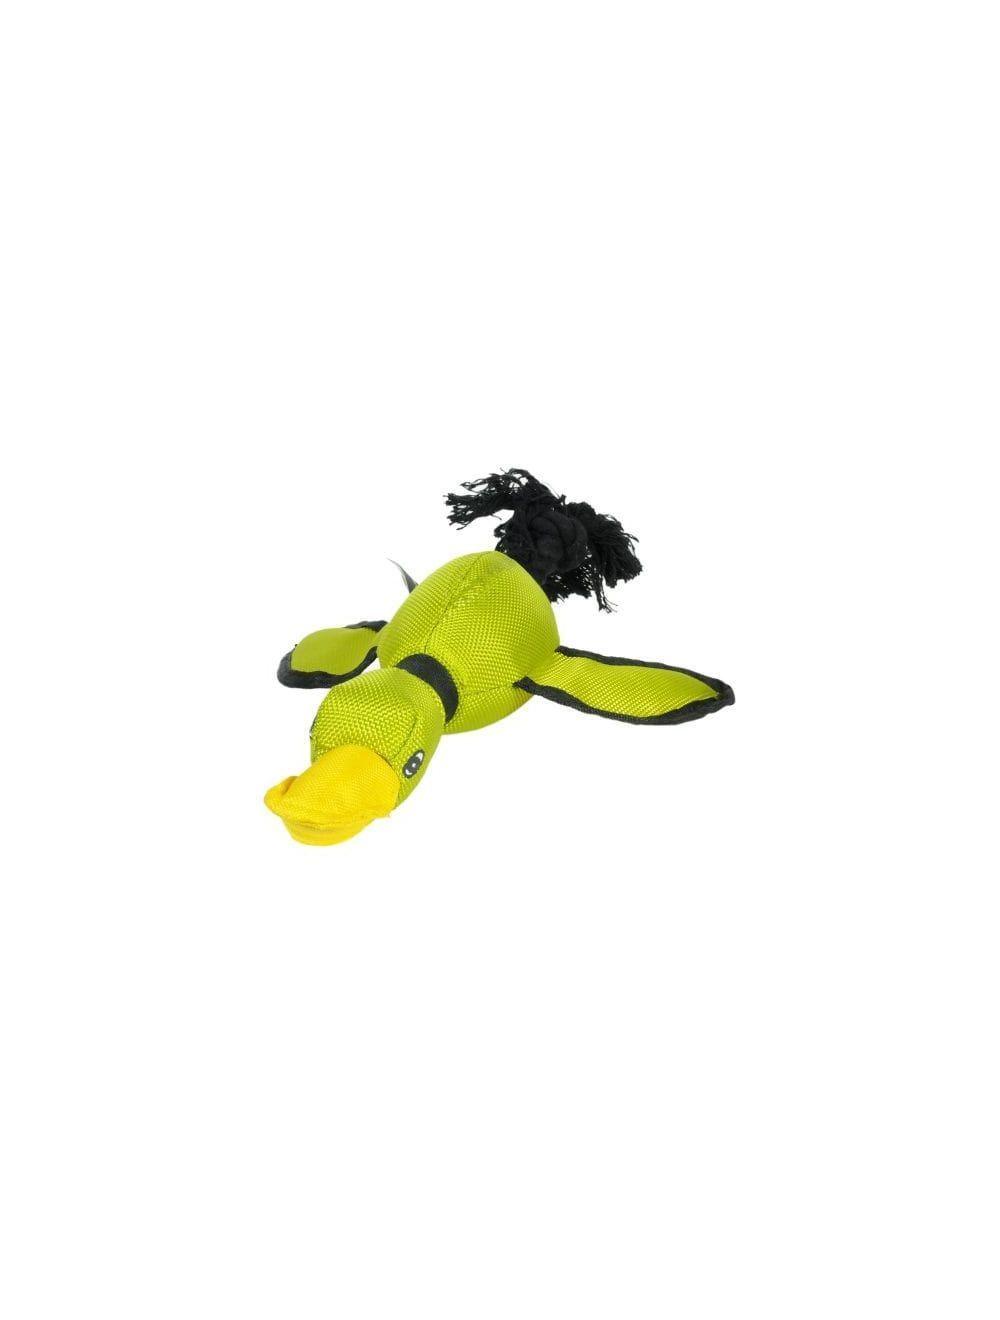 Hyper pet mini pato volador